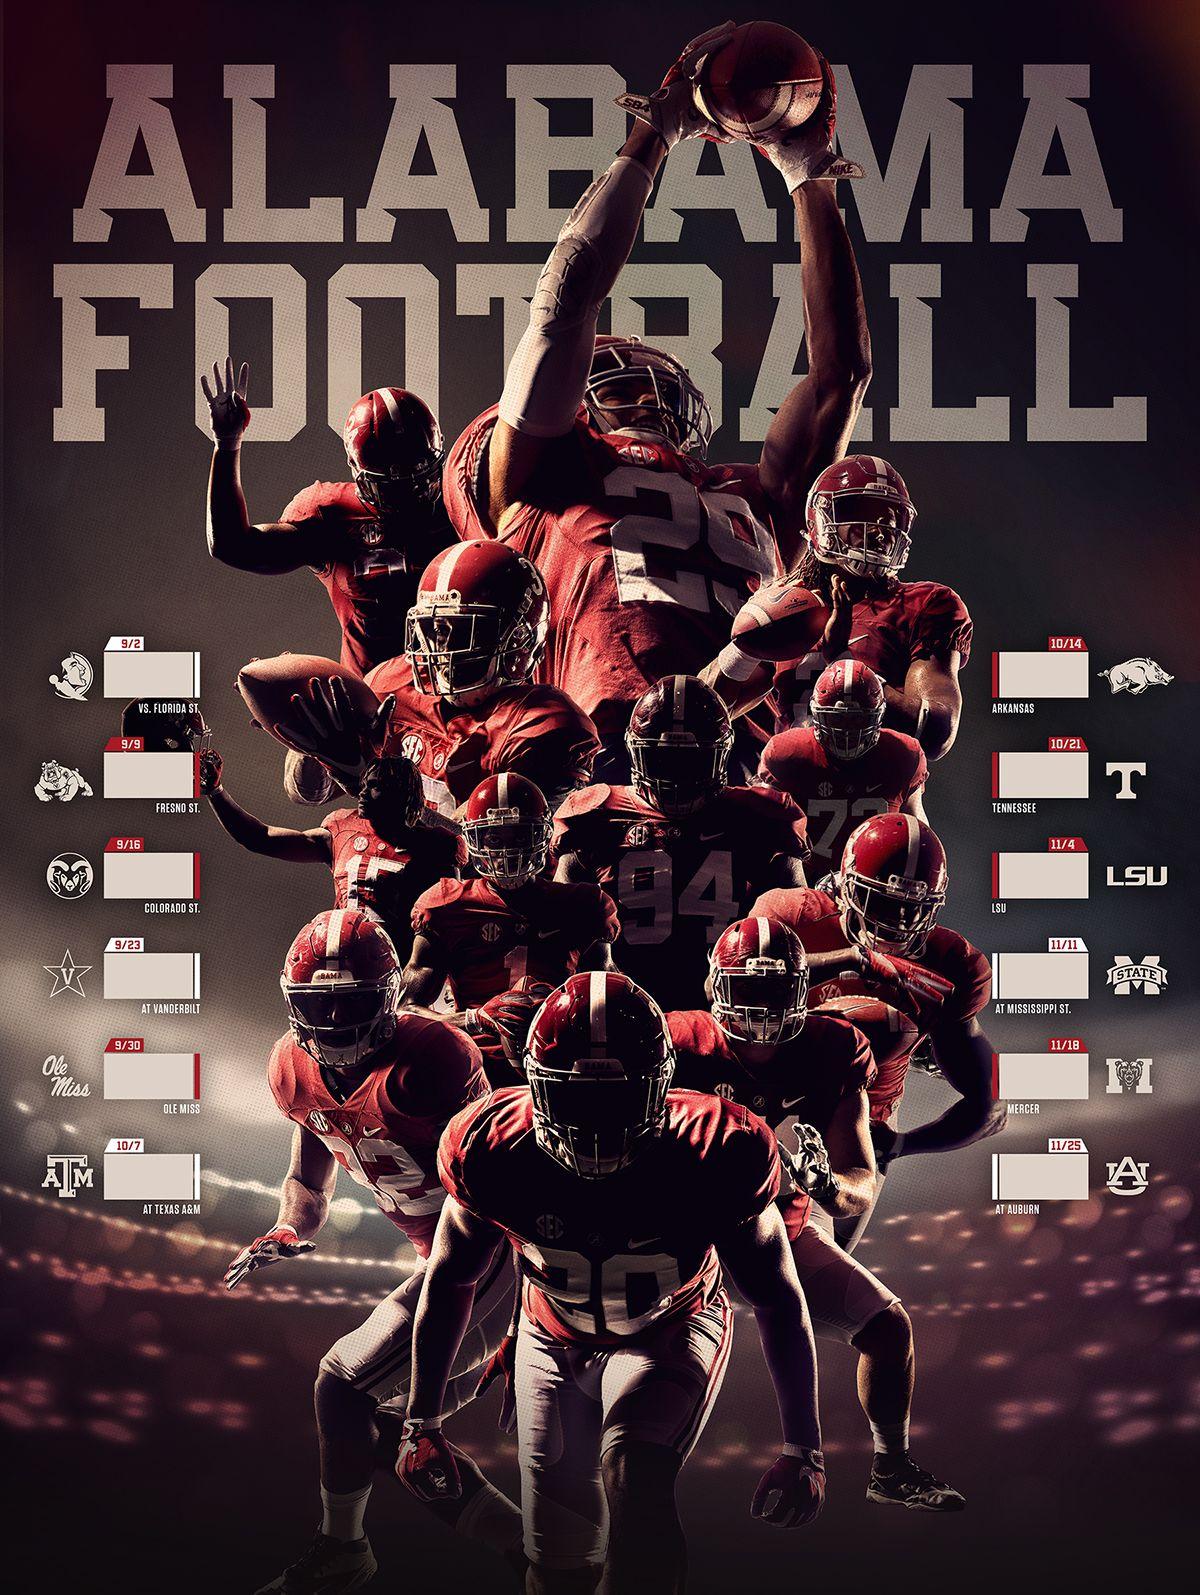 Alabama Football Schedule Poster 2017 On Behance Alabama Crimson Tide Football Alabama Football Schedule Alabama Football